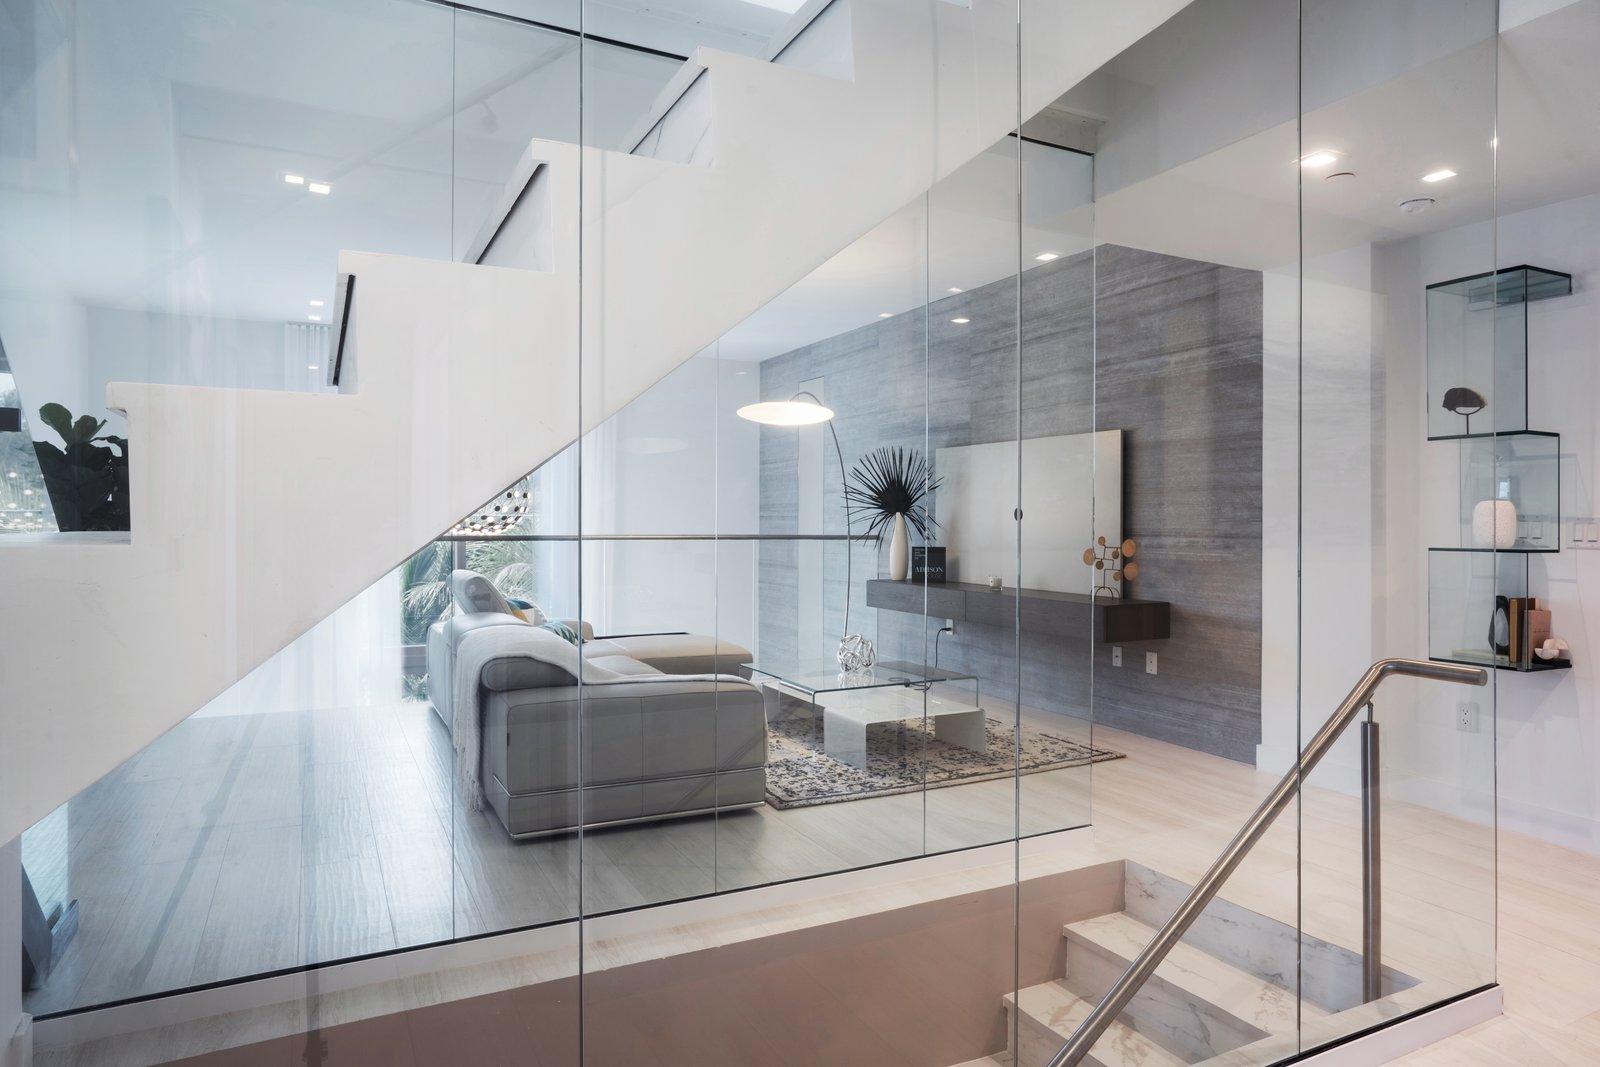 Second floor, multi-functional lounge room